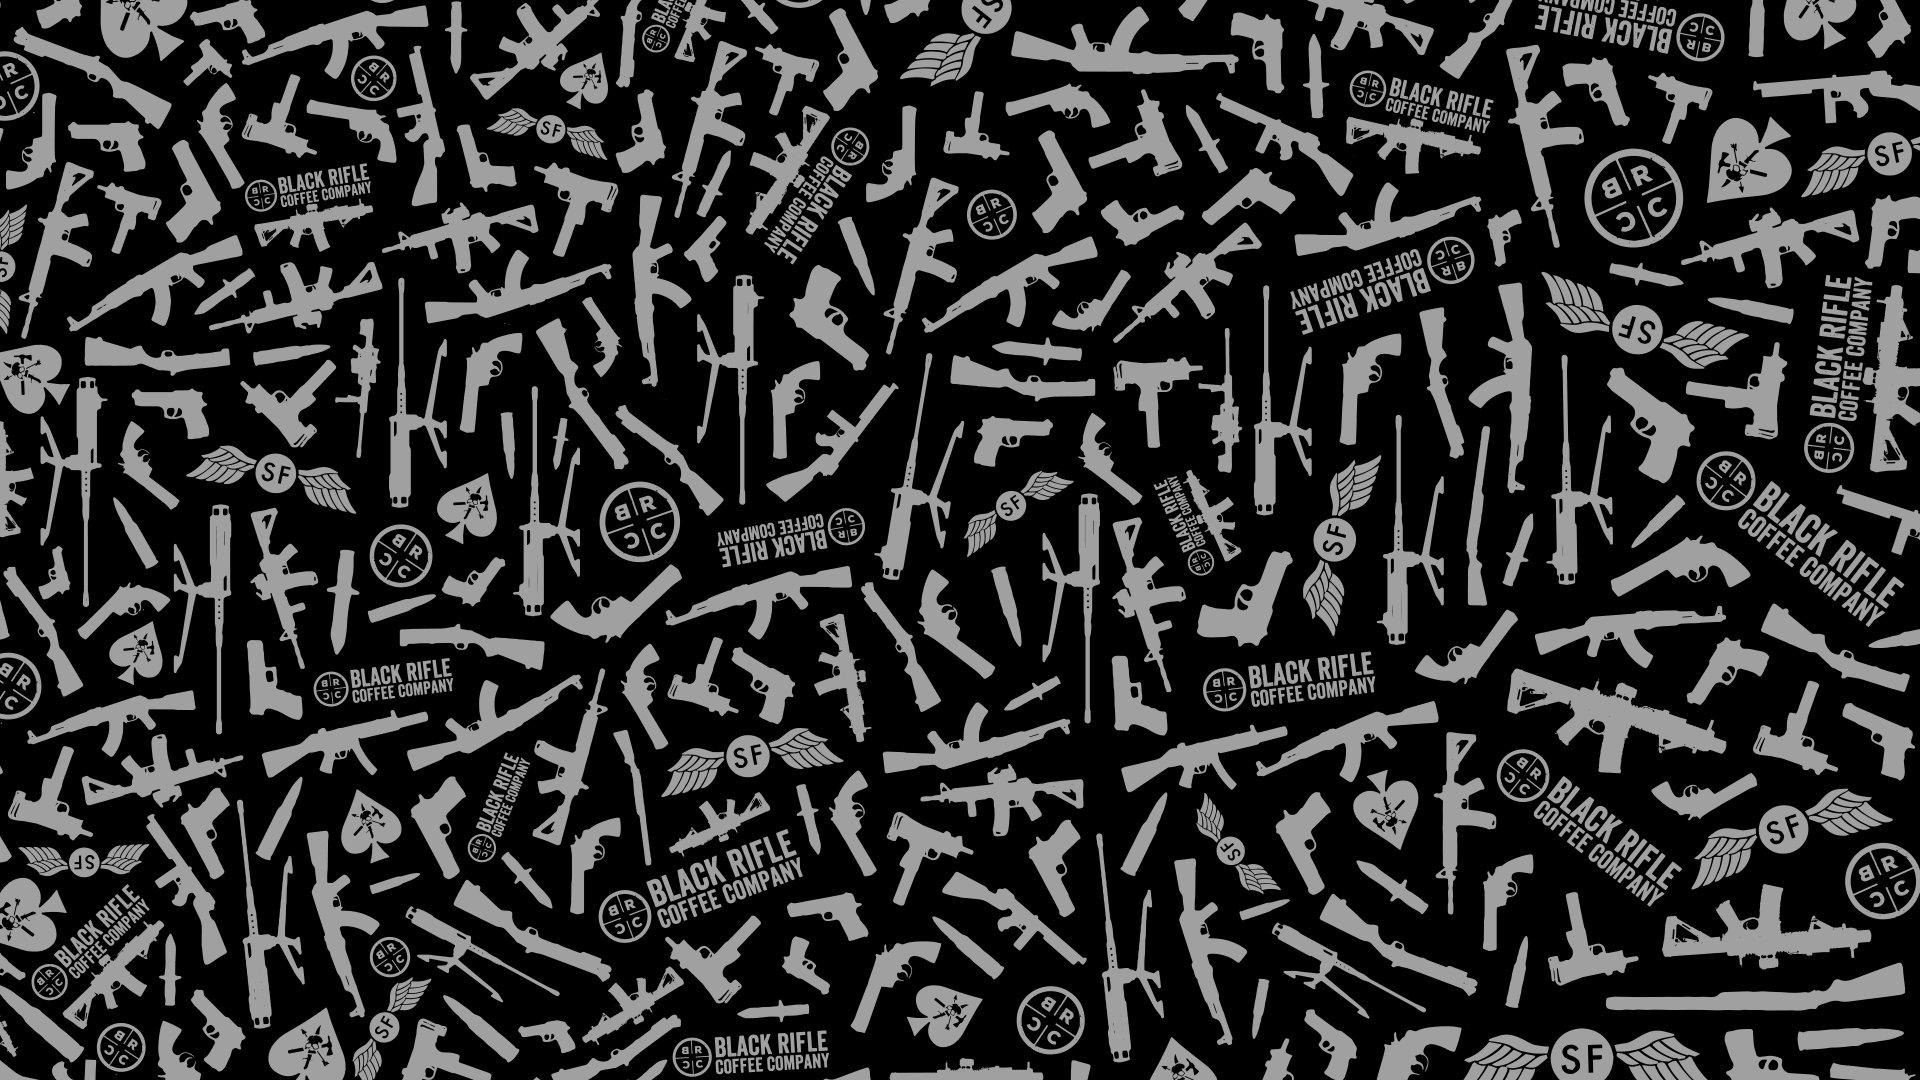 Phone Wallpapers Black Rifle Coffee Company 1920x1080